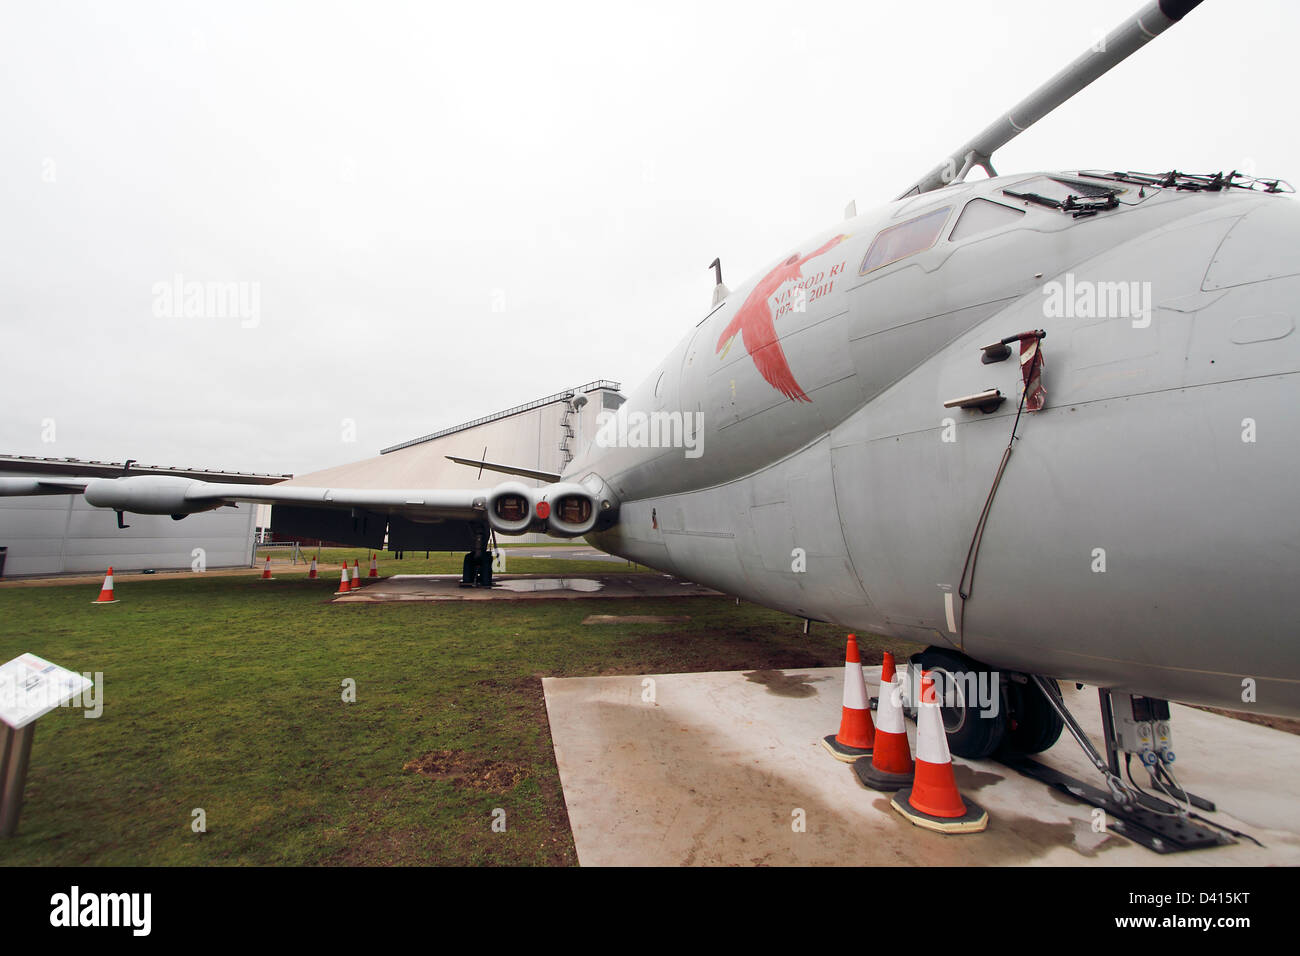 Nimrod R.1 original design was the De Havilland Comet airliner. Maritime Patrol aircraft. Three were modified for - Stock Image